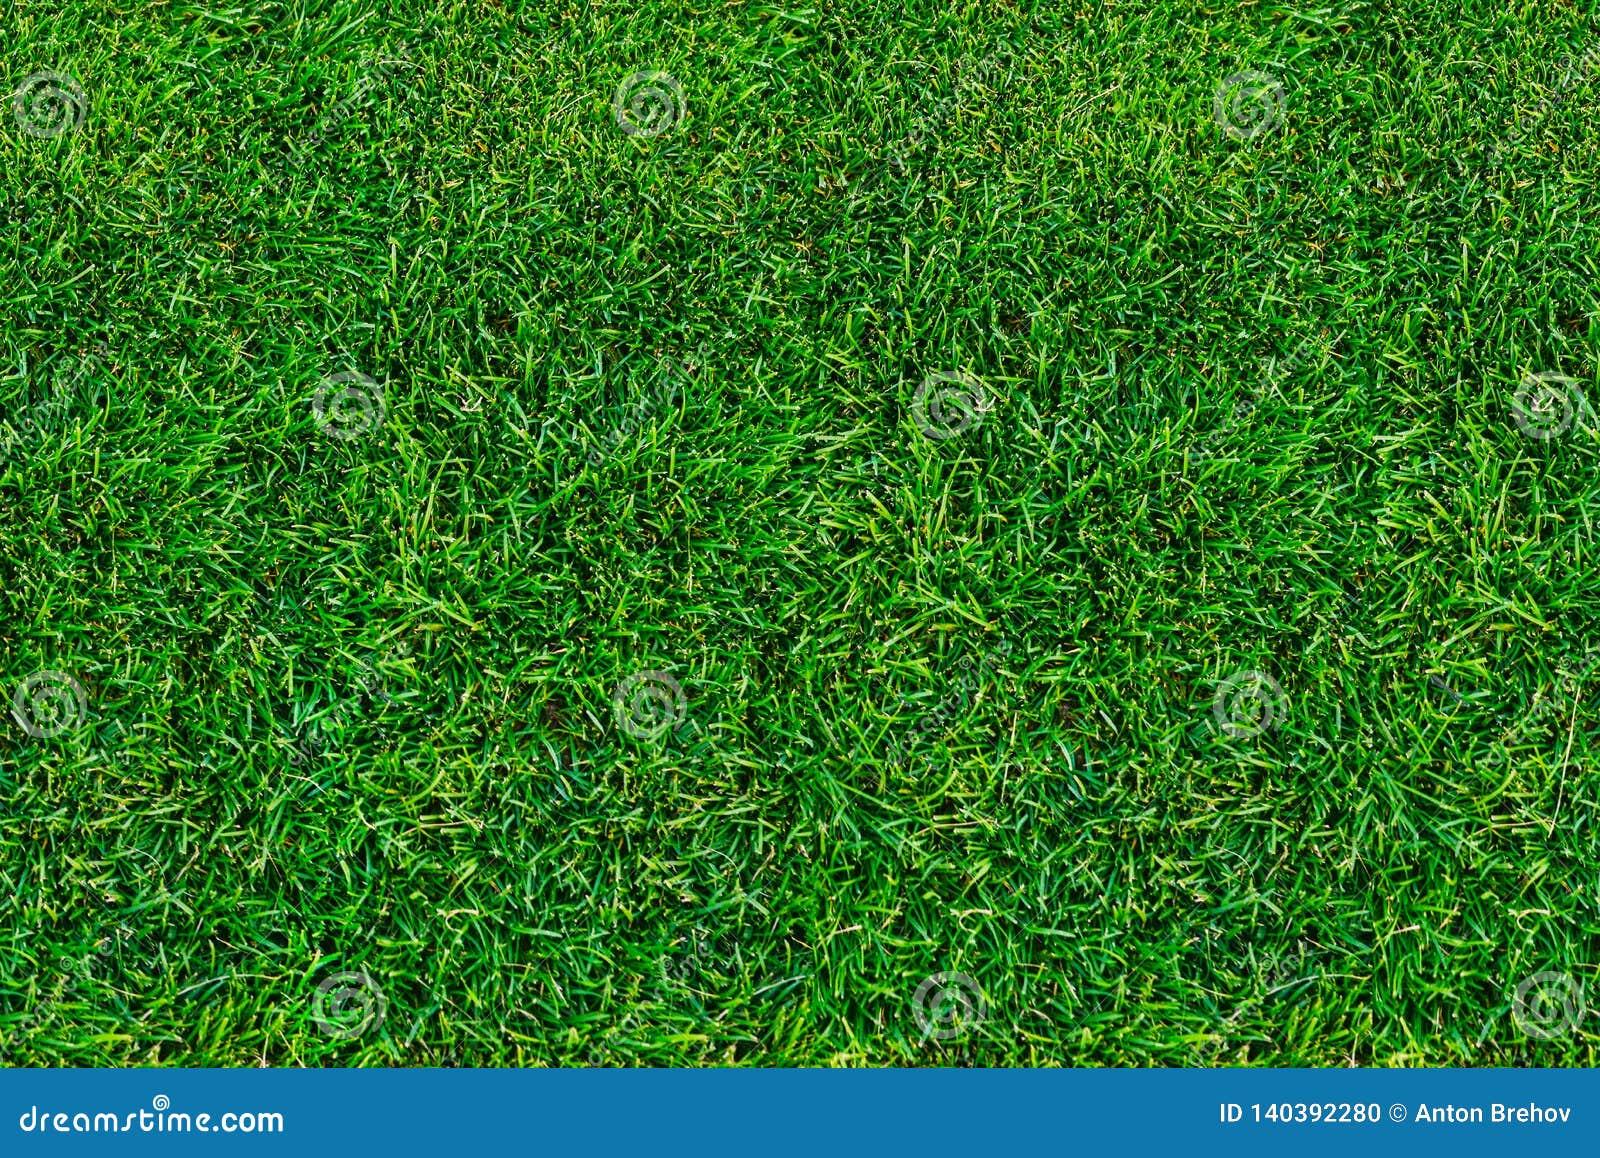 Gräsmatta grönt gräs i sommar ovanför sikt närbild naturlig bakgrund